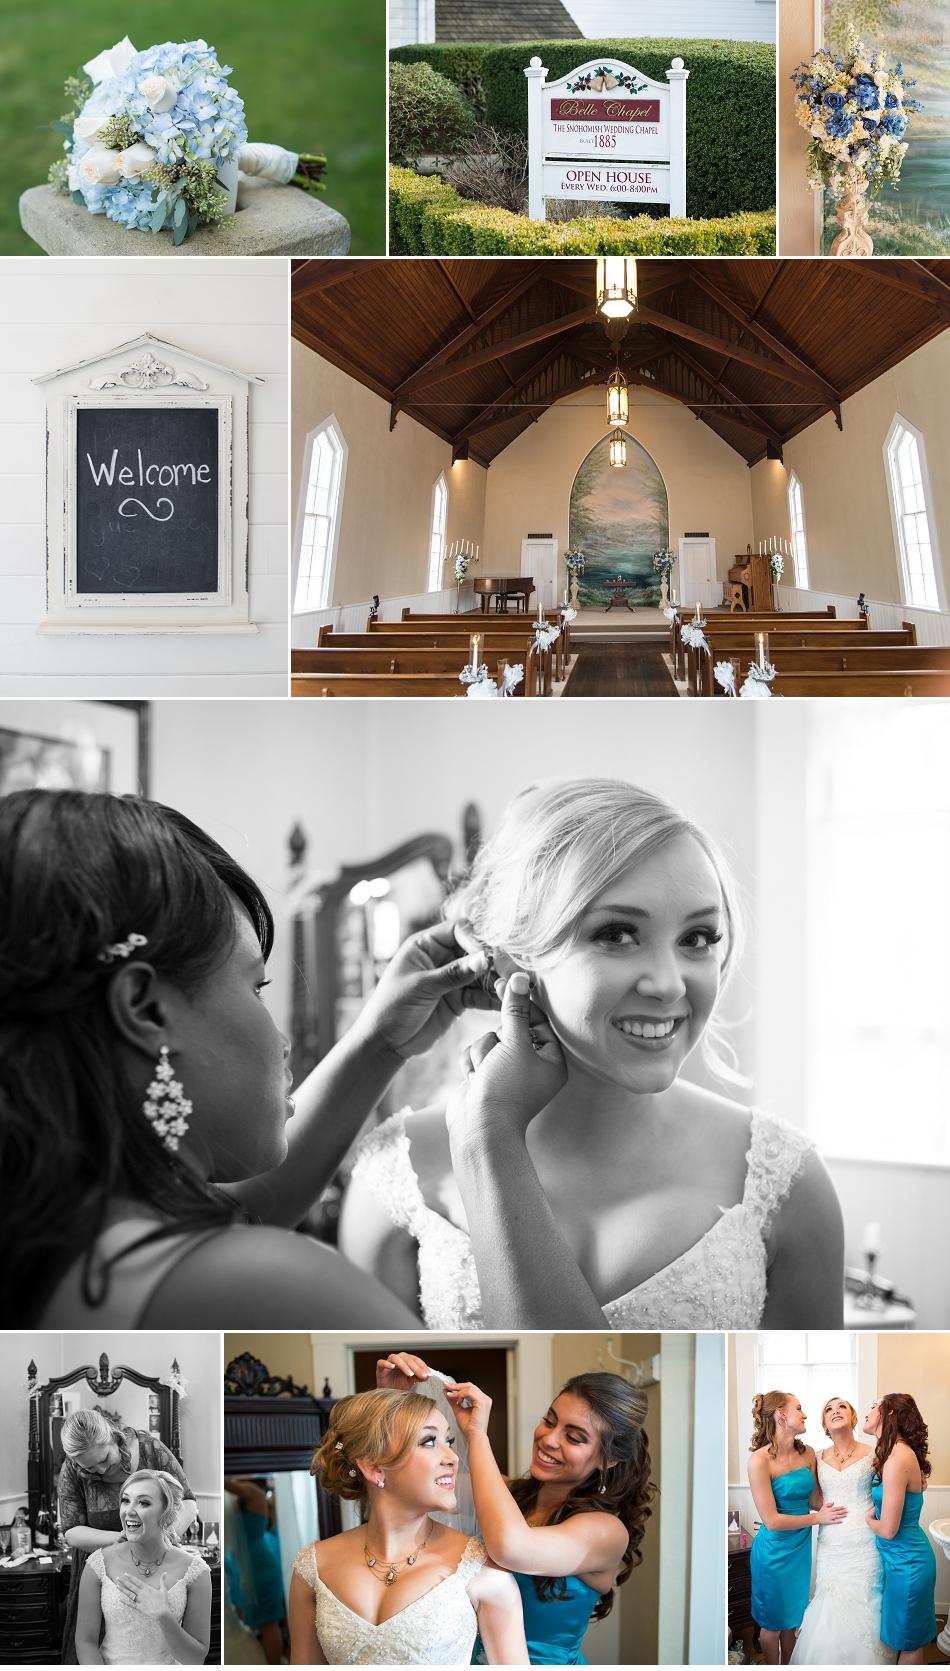 Belle Chapel Wedding Photographer, Snohomish, WA - Jared M. Burns (1)